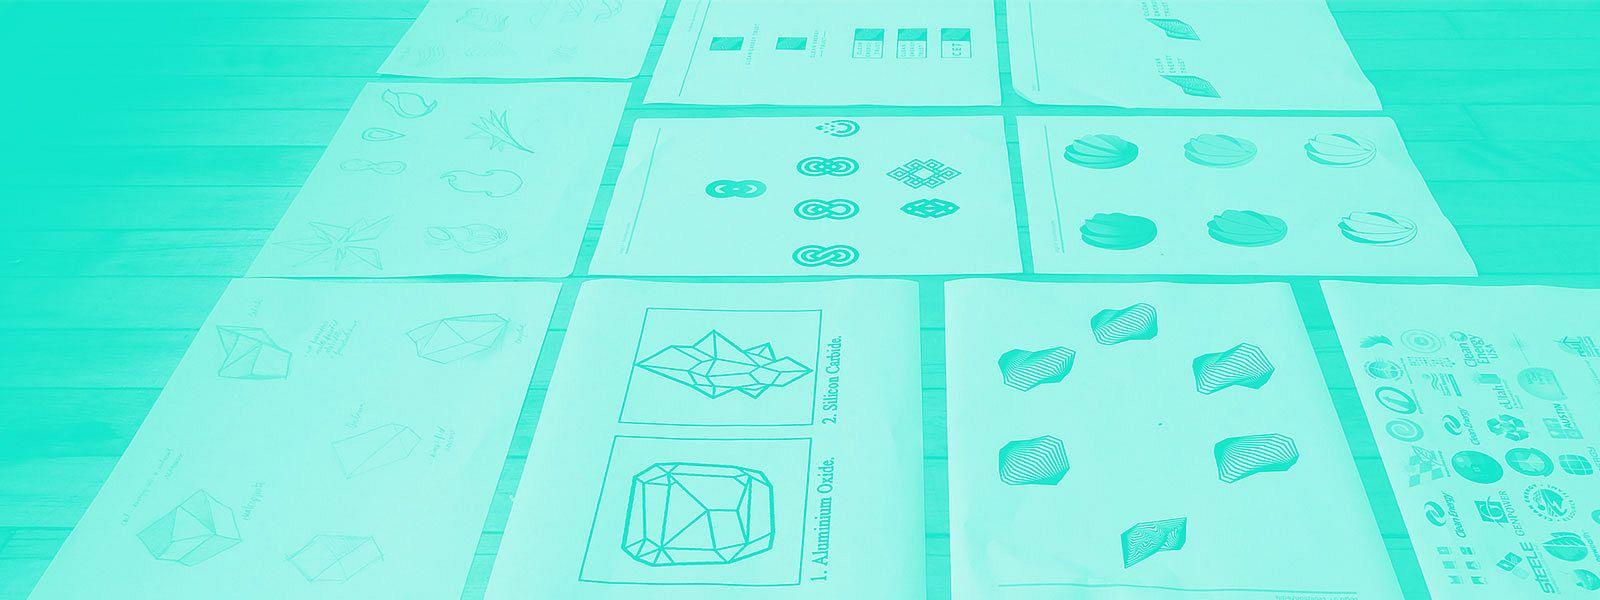 Re-branding Design Procress